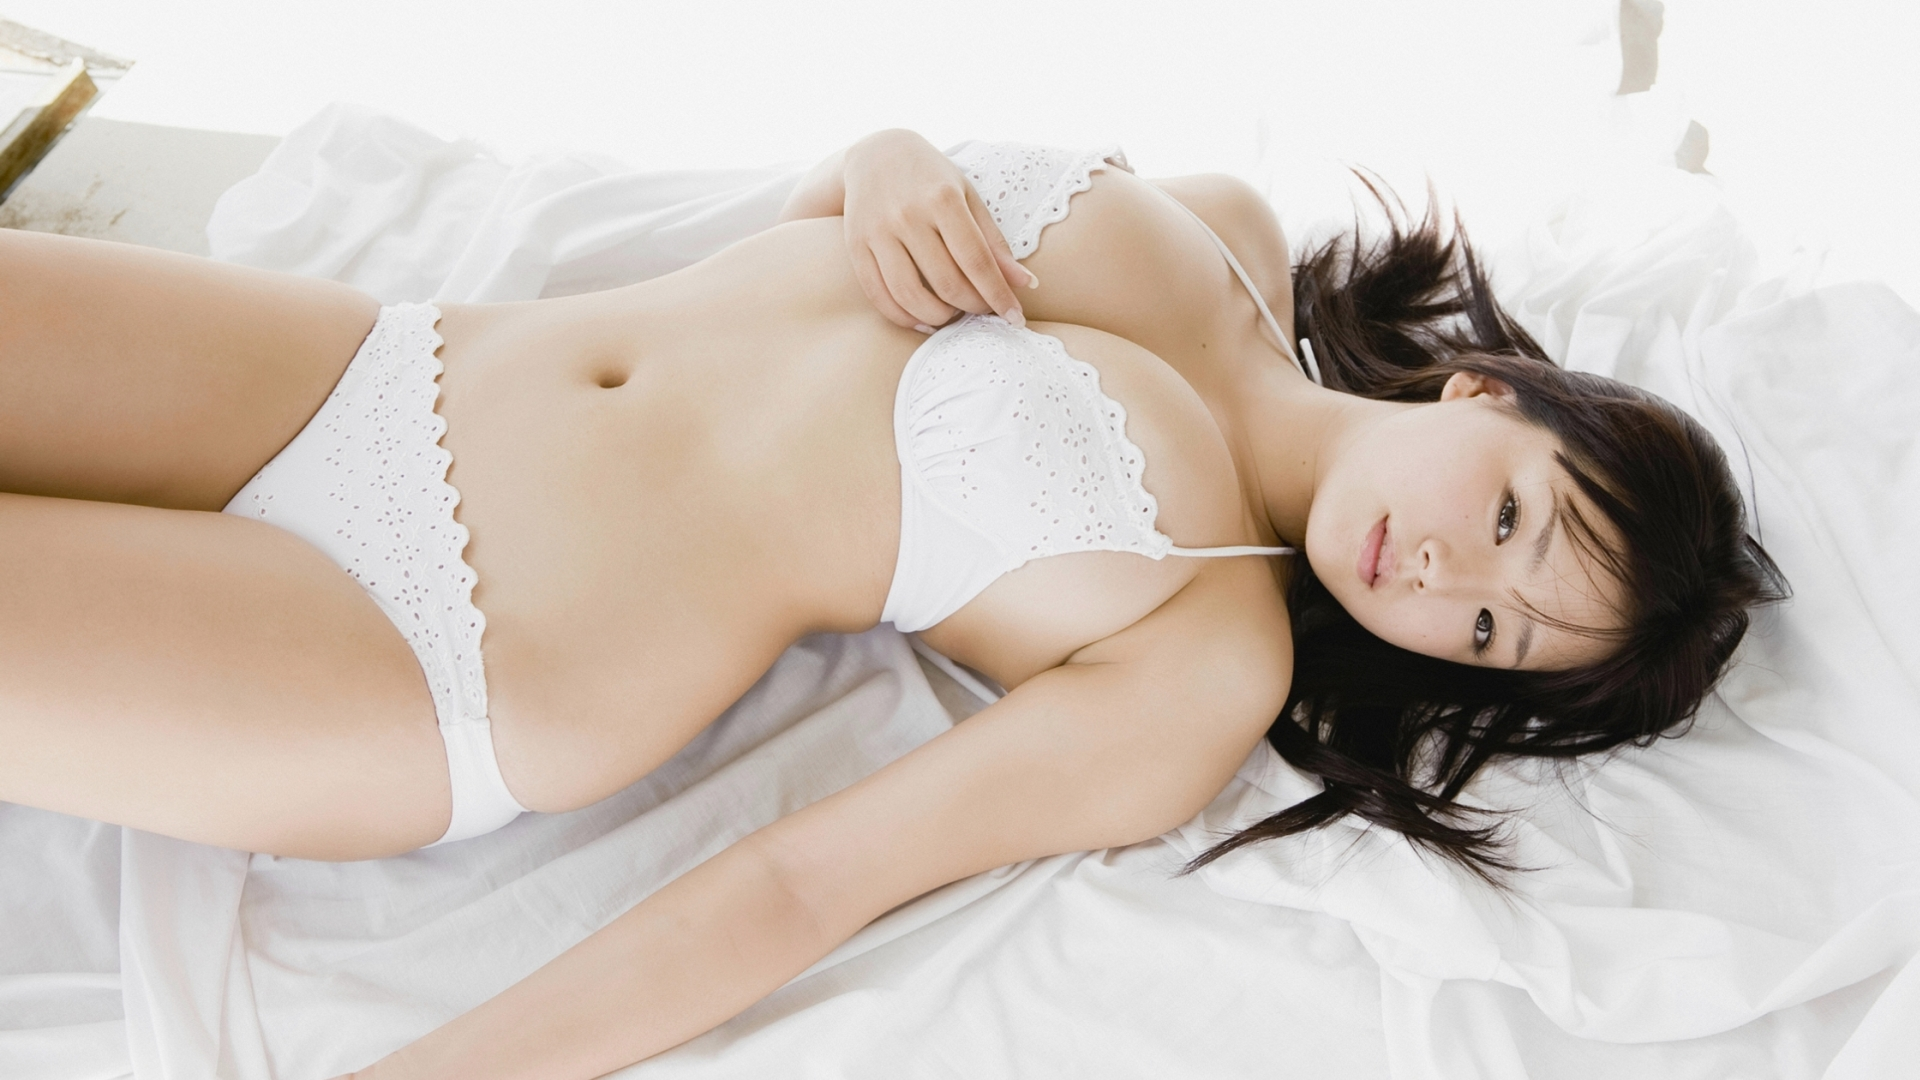 People 1920x1080 white panties Ai Shinozaki curvy Asian brunette white bikini lingerie cleavage panties bra lying on back big boobs